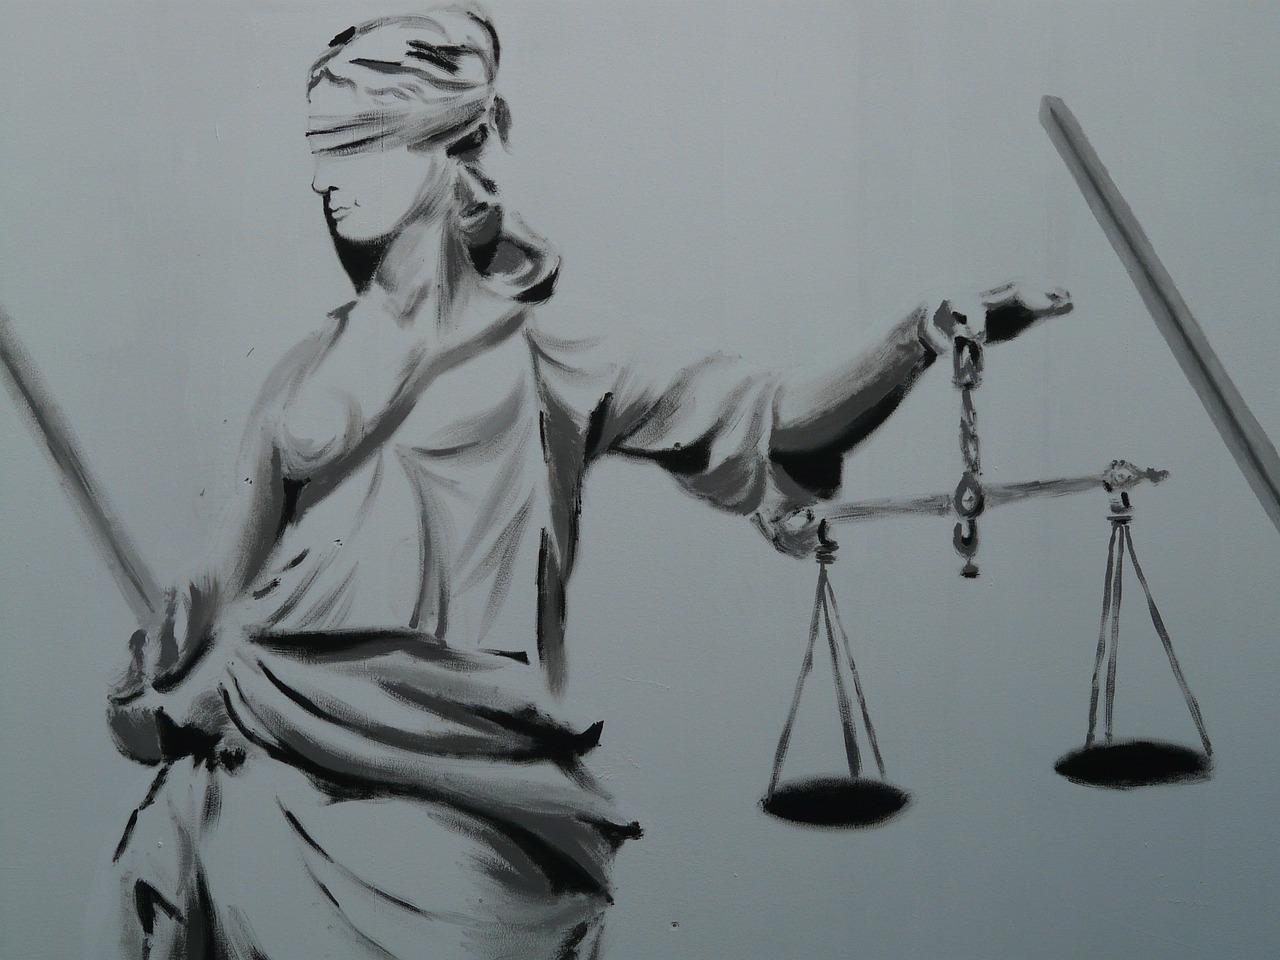 justice-9017_1280